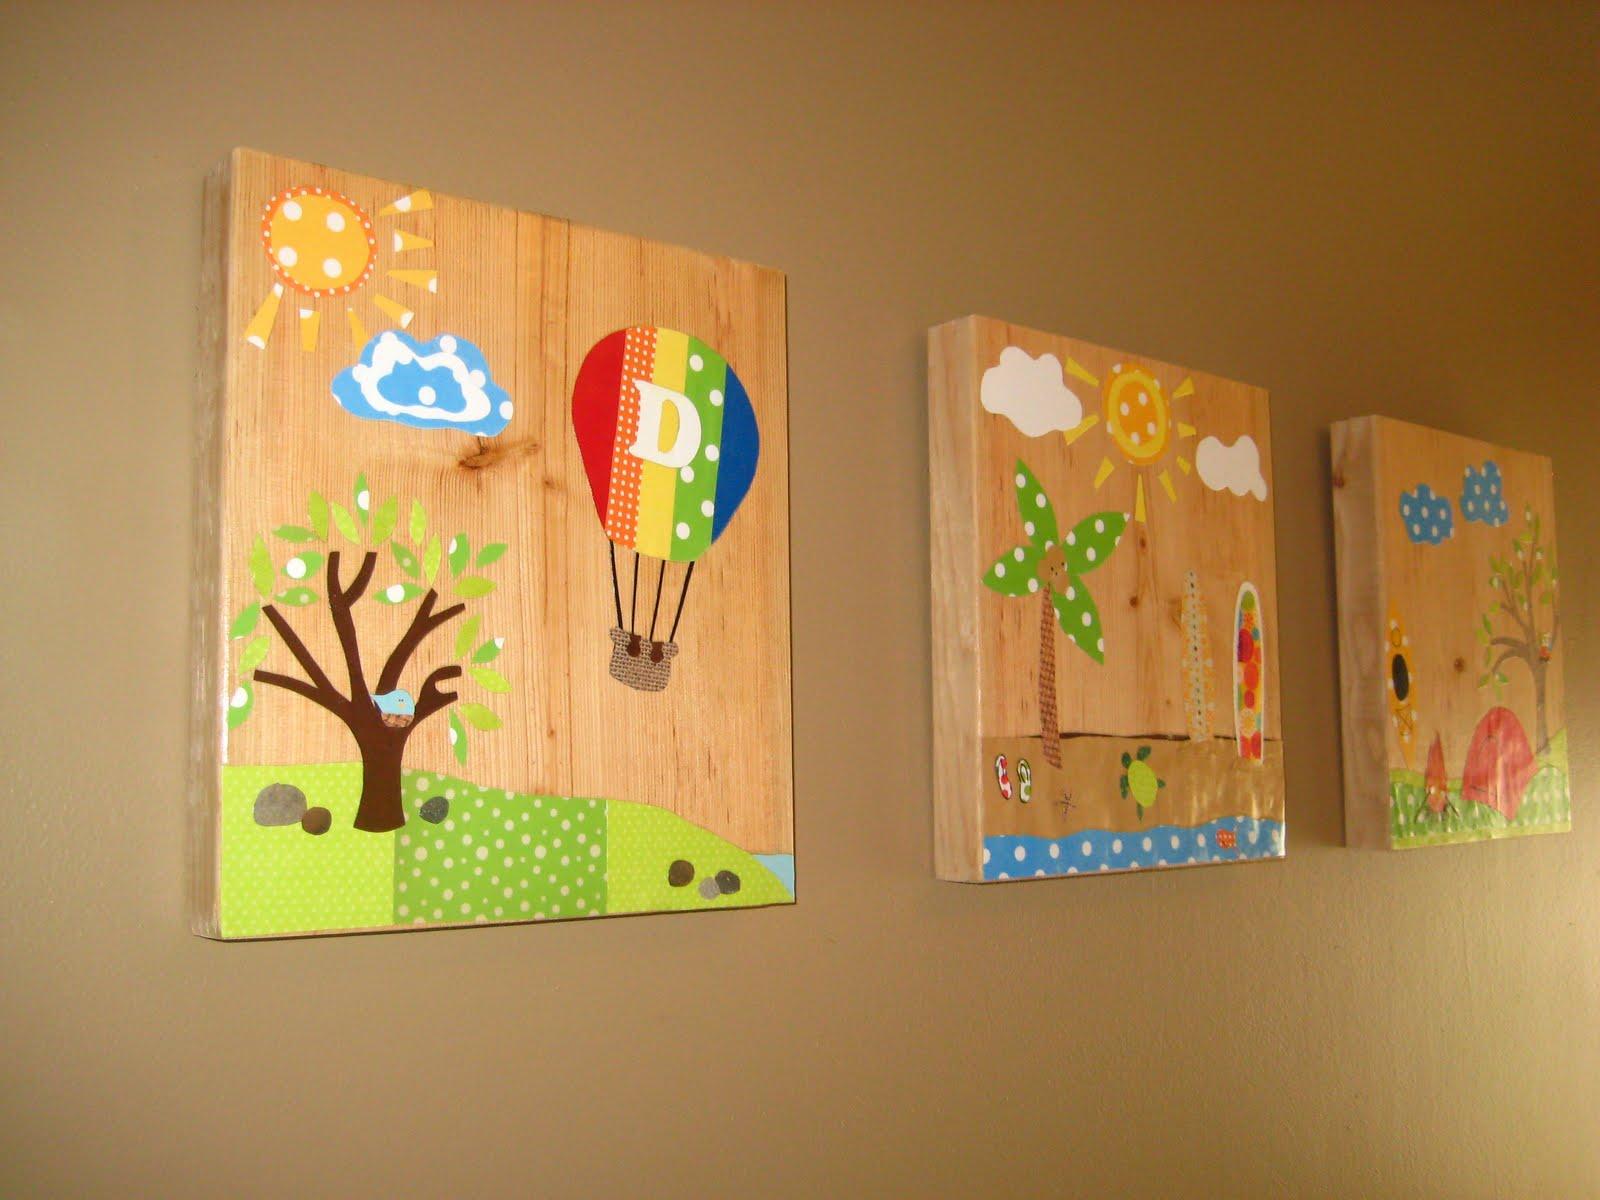 DIY Art For Kids Rooms - Design Dazzle